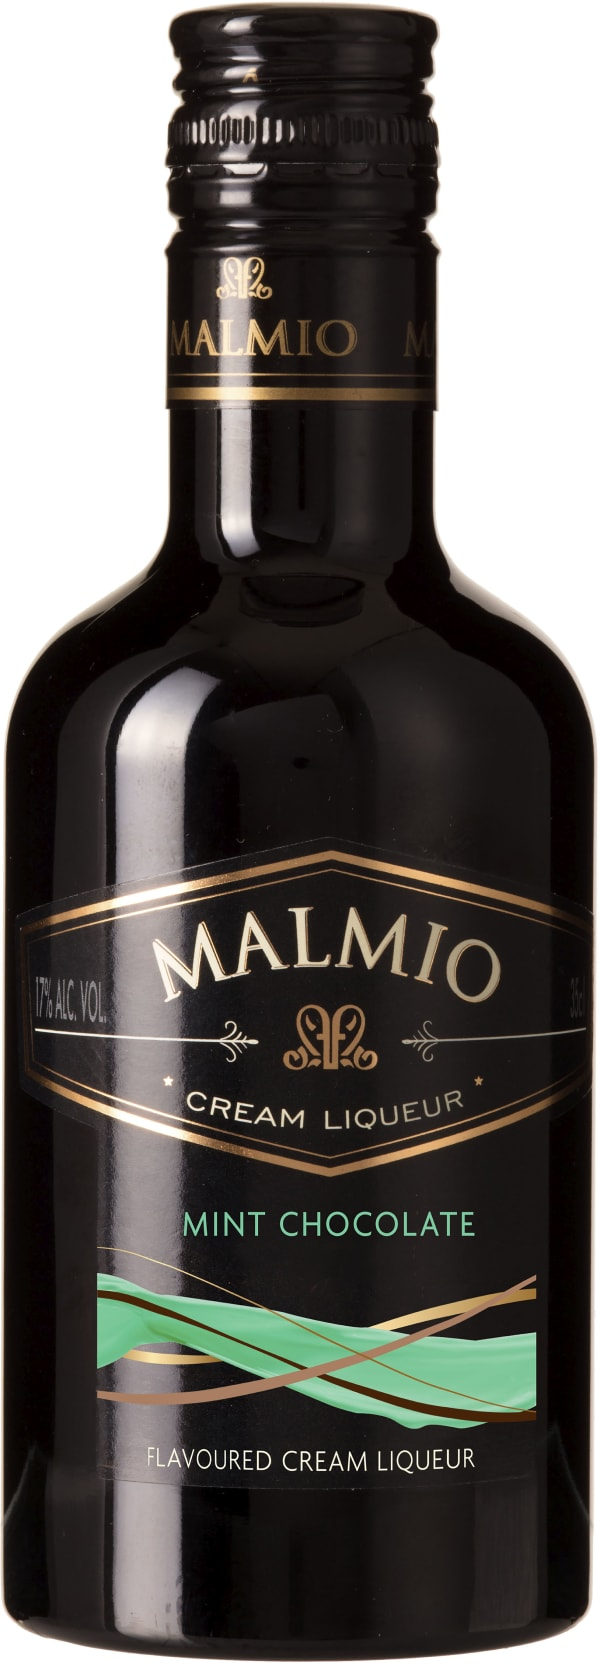 Malmio Mint Chocolate plastic bottle